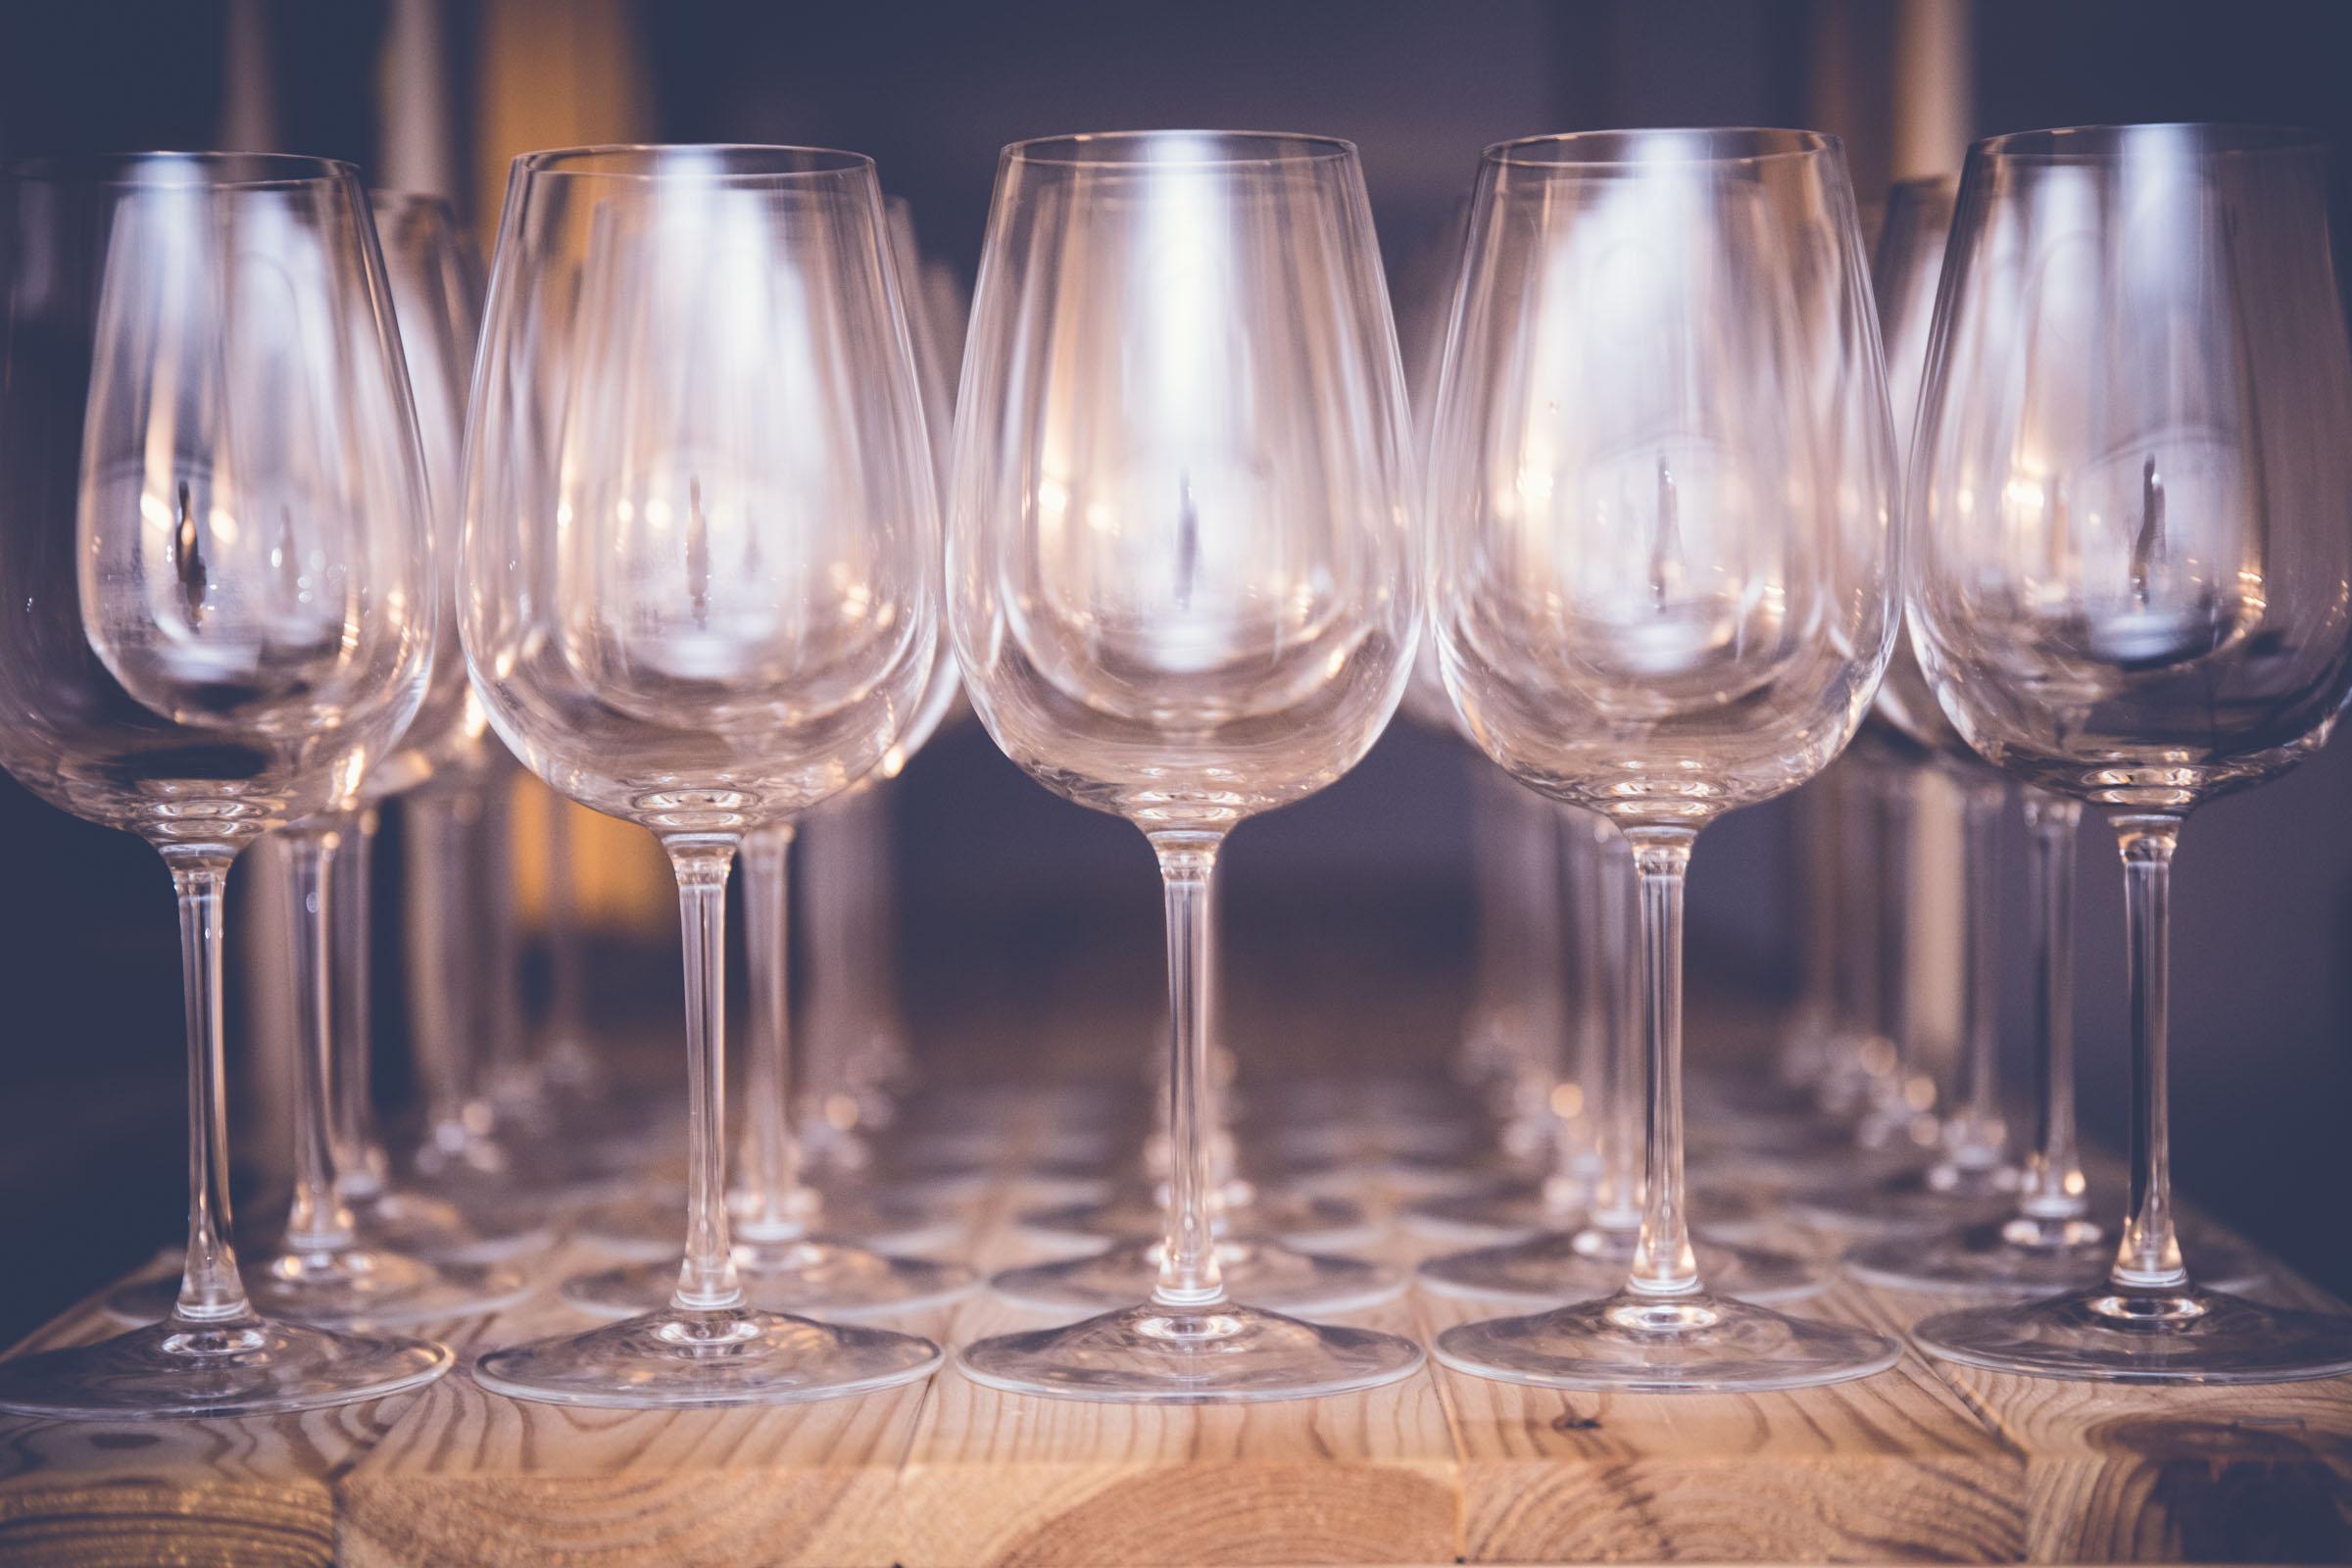 Barformat Hannover - Weine | Aperitif | Cocktails | Gutsabfüllung | Hochzeit | Event | Gala | Firmenevent |Catering | Hannover | Braunschweig | Hameln